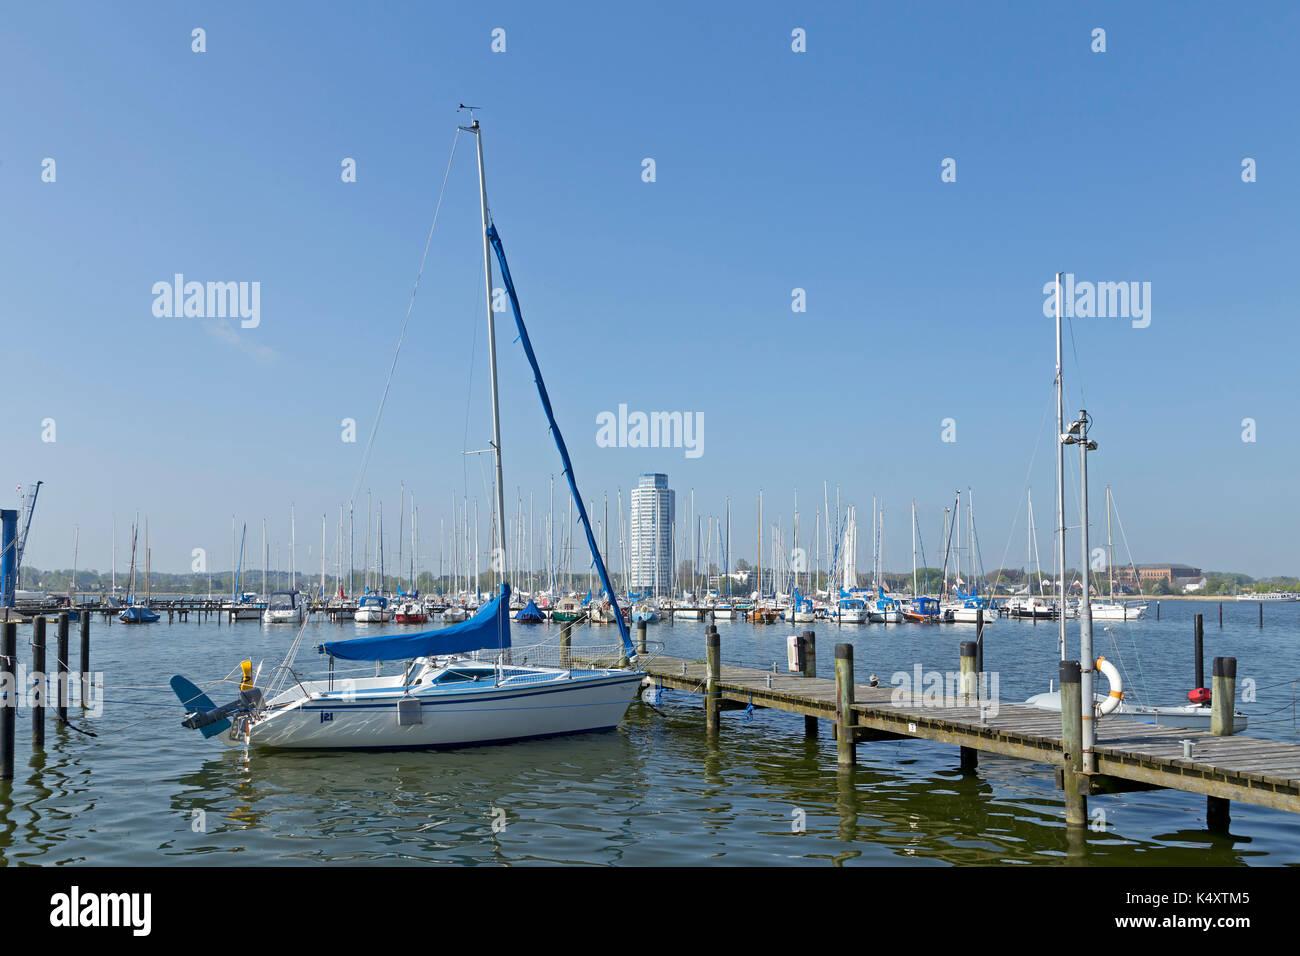 Marina, Schleswig, Schlei, Schleswig-Holstein, Germany - Stock Image